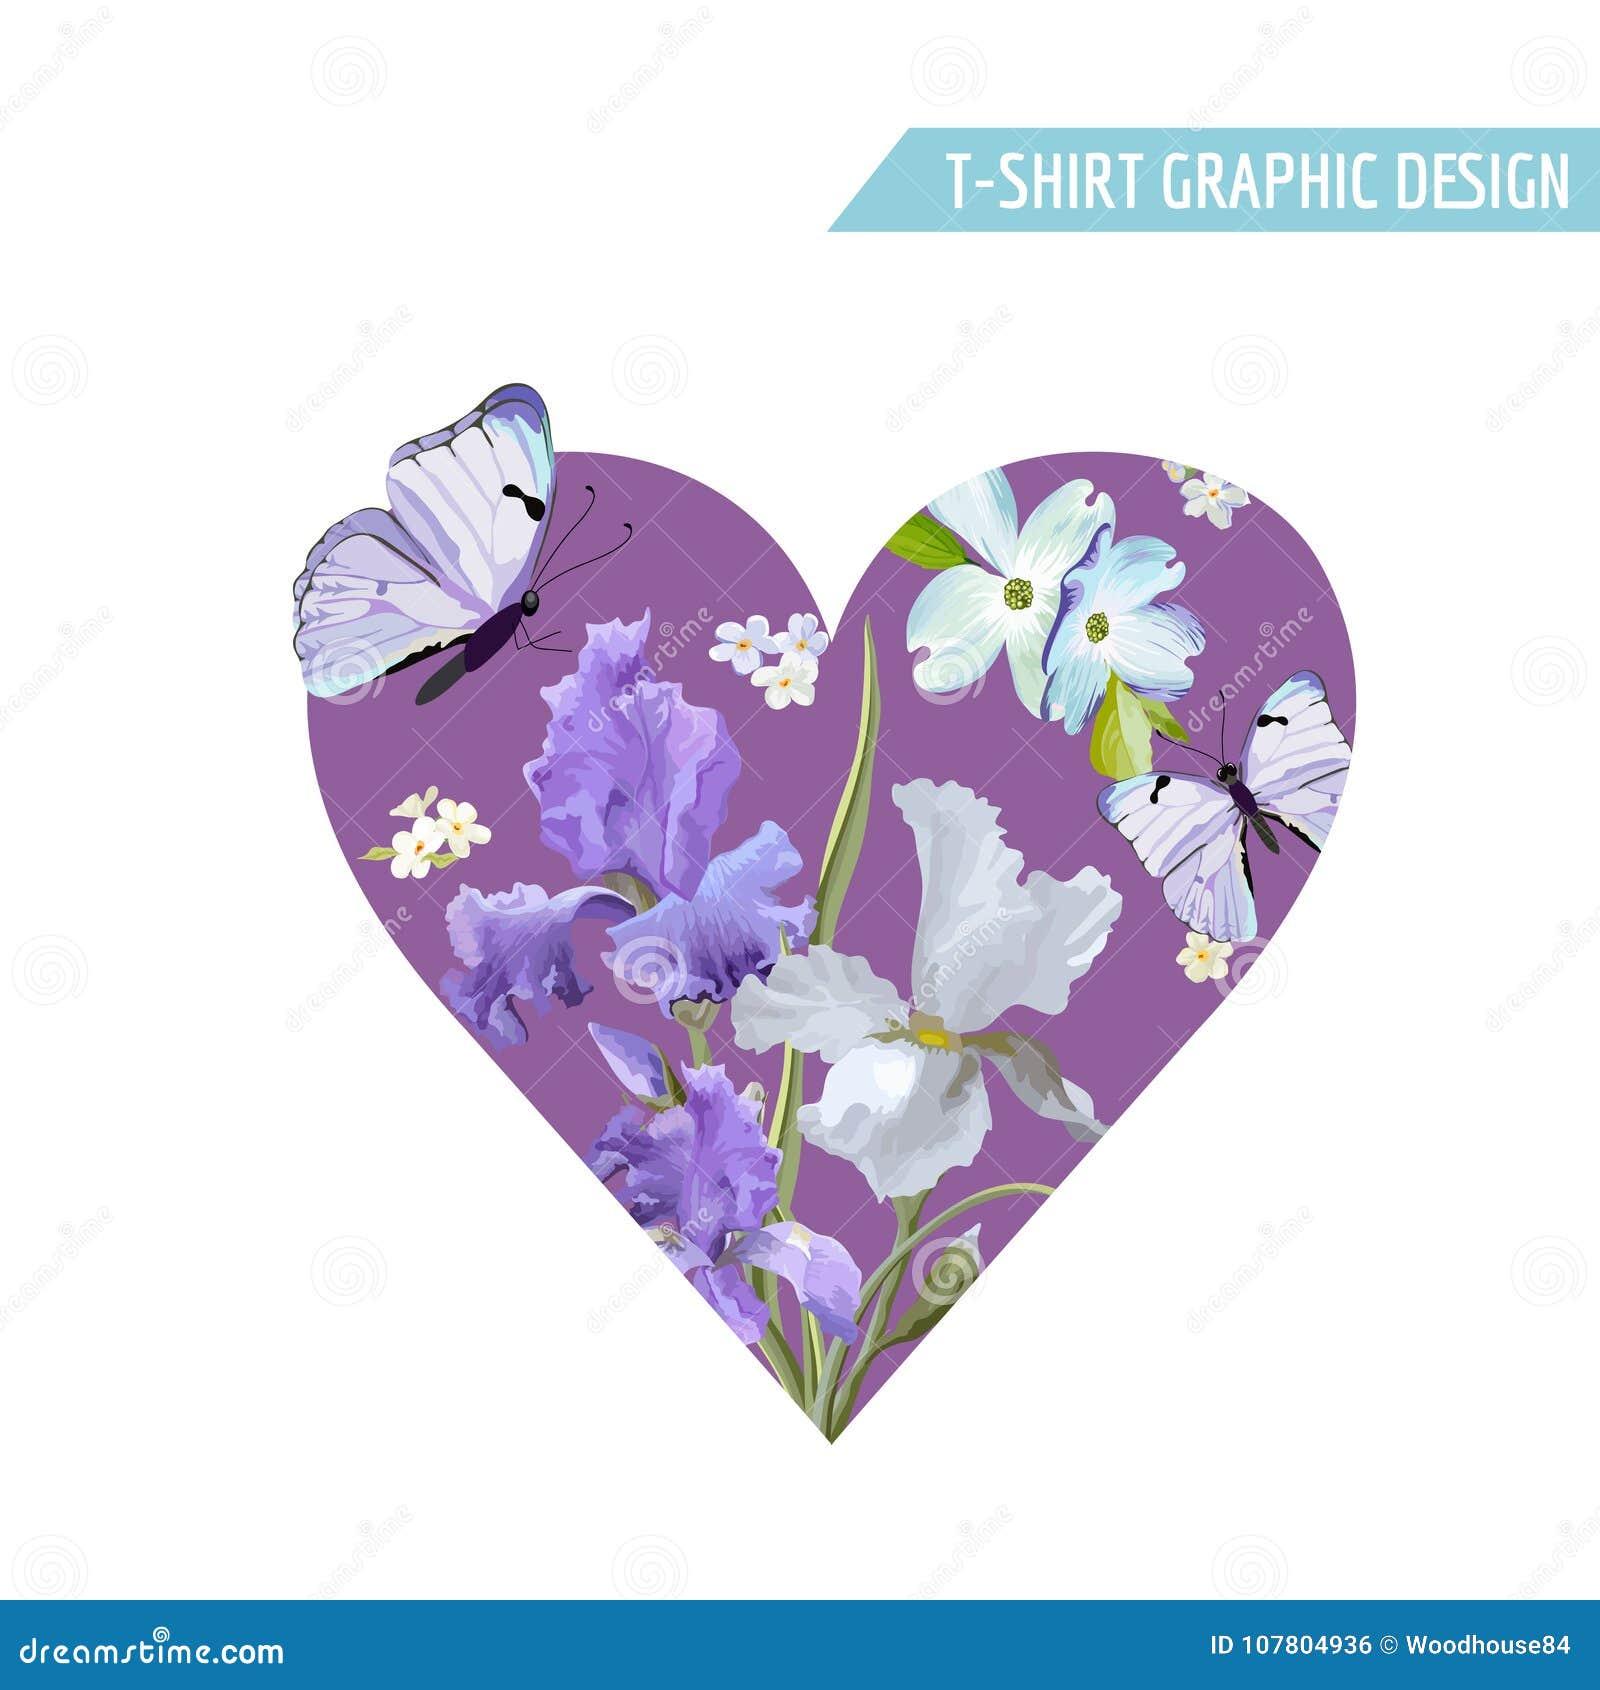 Love T Shirt Design With Flowers Butterflies Stock Vector